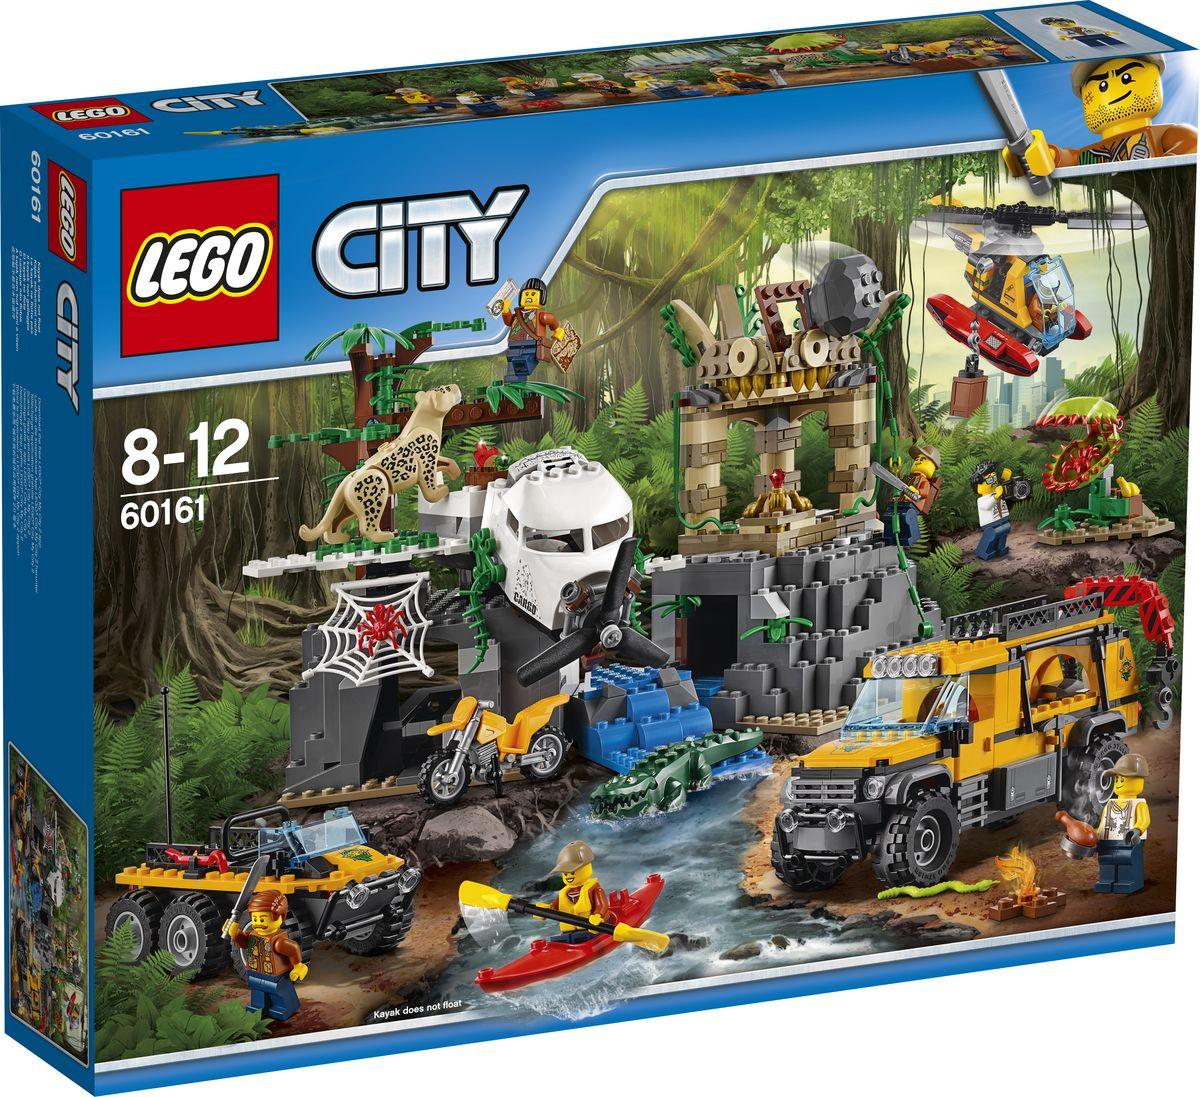 LEGO City Jungle Explorer Конструктор База исследователей джунглей 60161 конструктор lego city jungle explorer исследование джунглей 60159